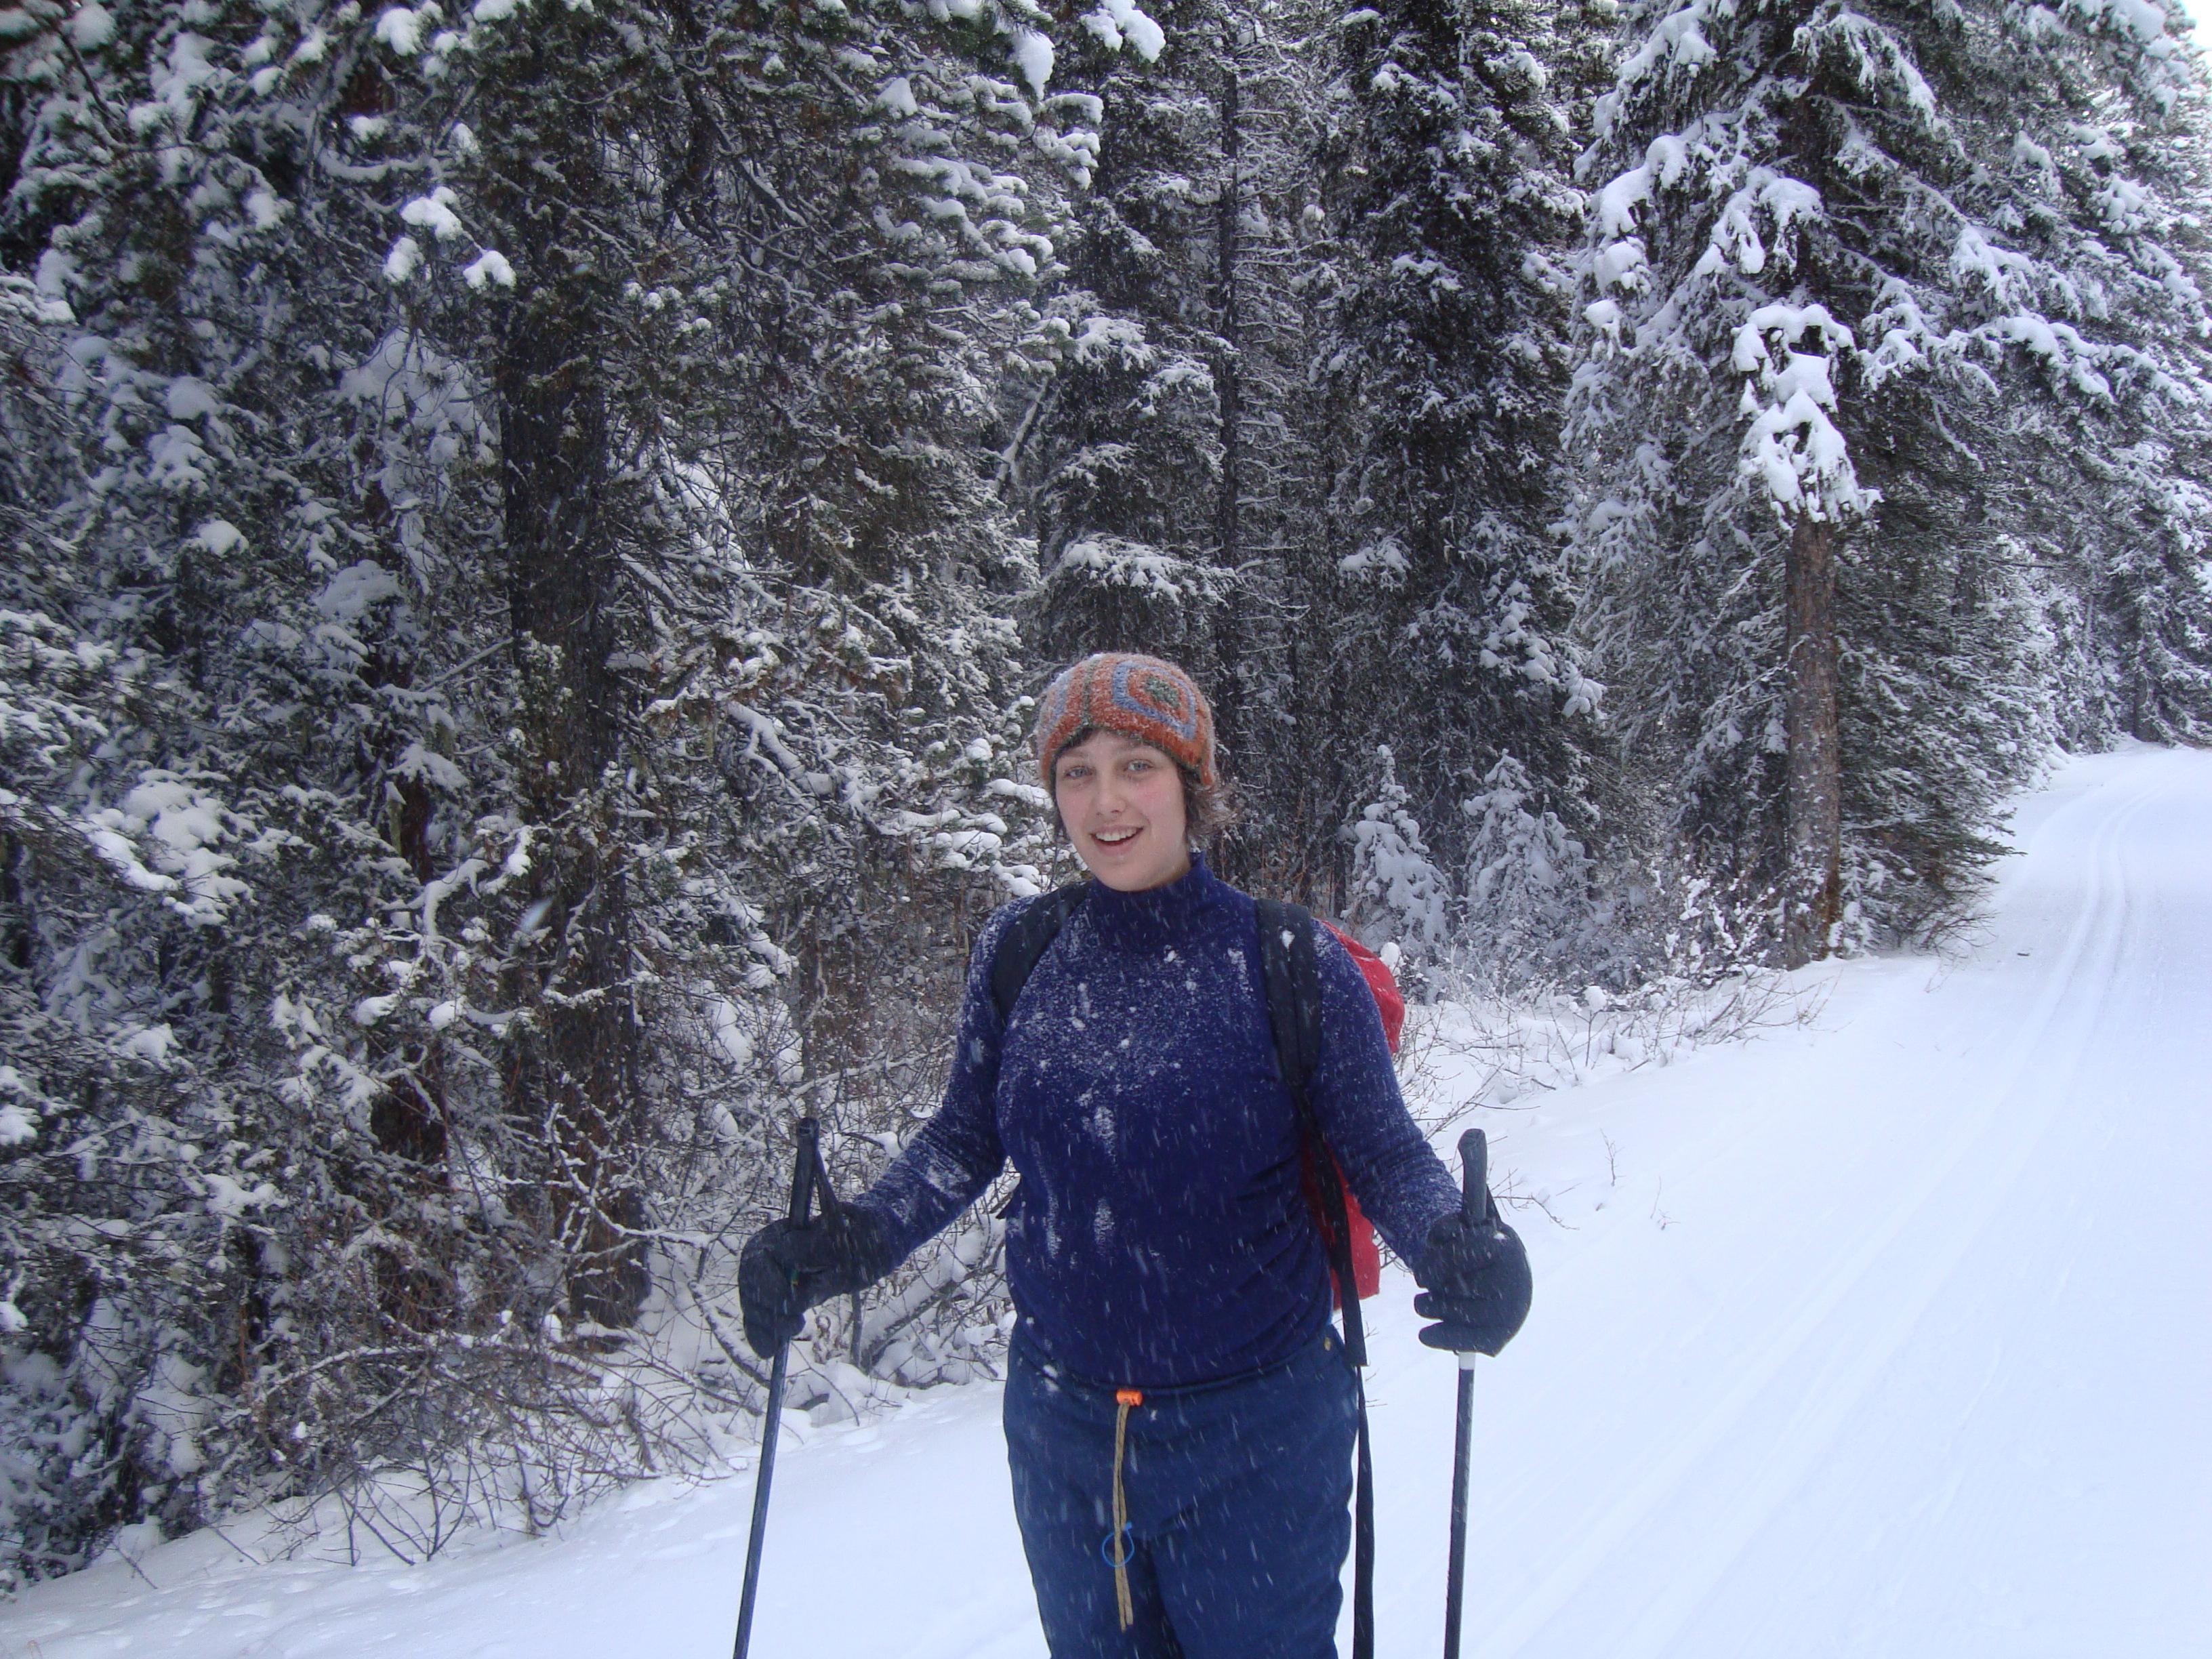 Kay skiing on Goat Creek Dec 30, 2008